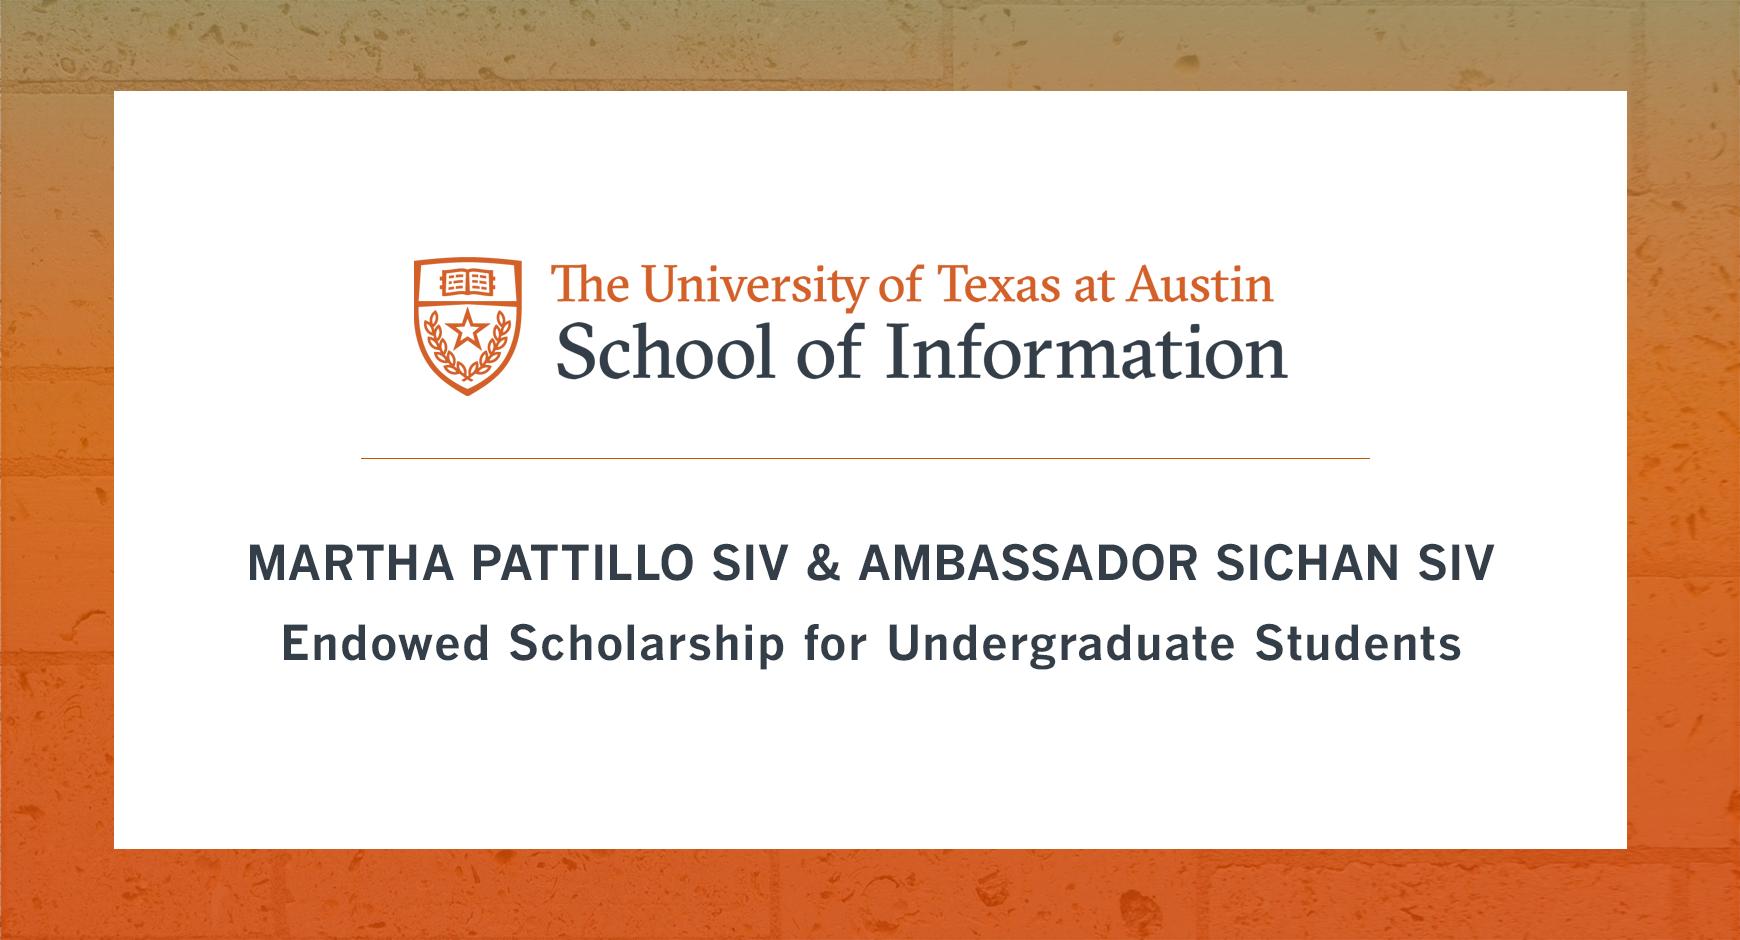 Martha Pattillo Siv and Ambassador Sichan Siv Endowed Scholarship